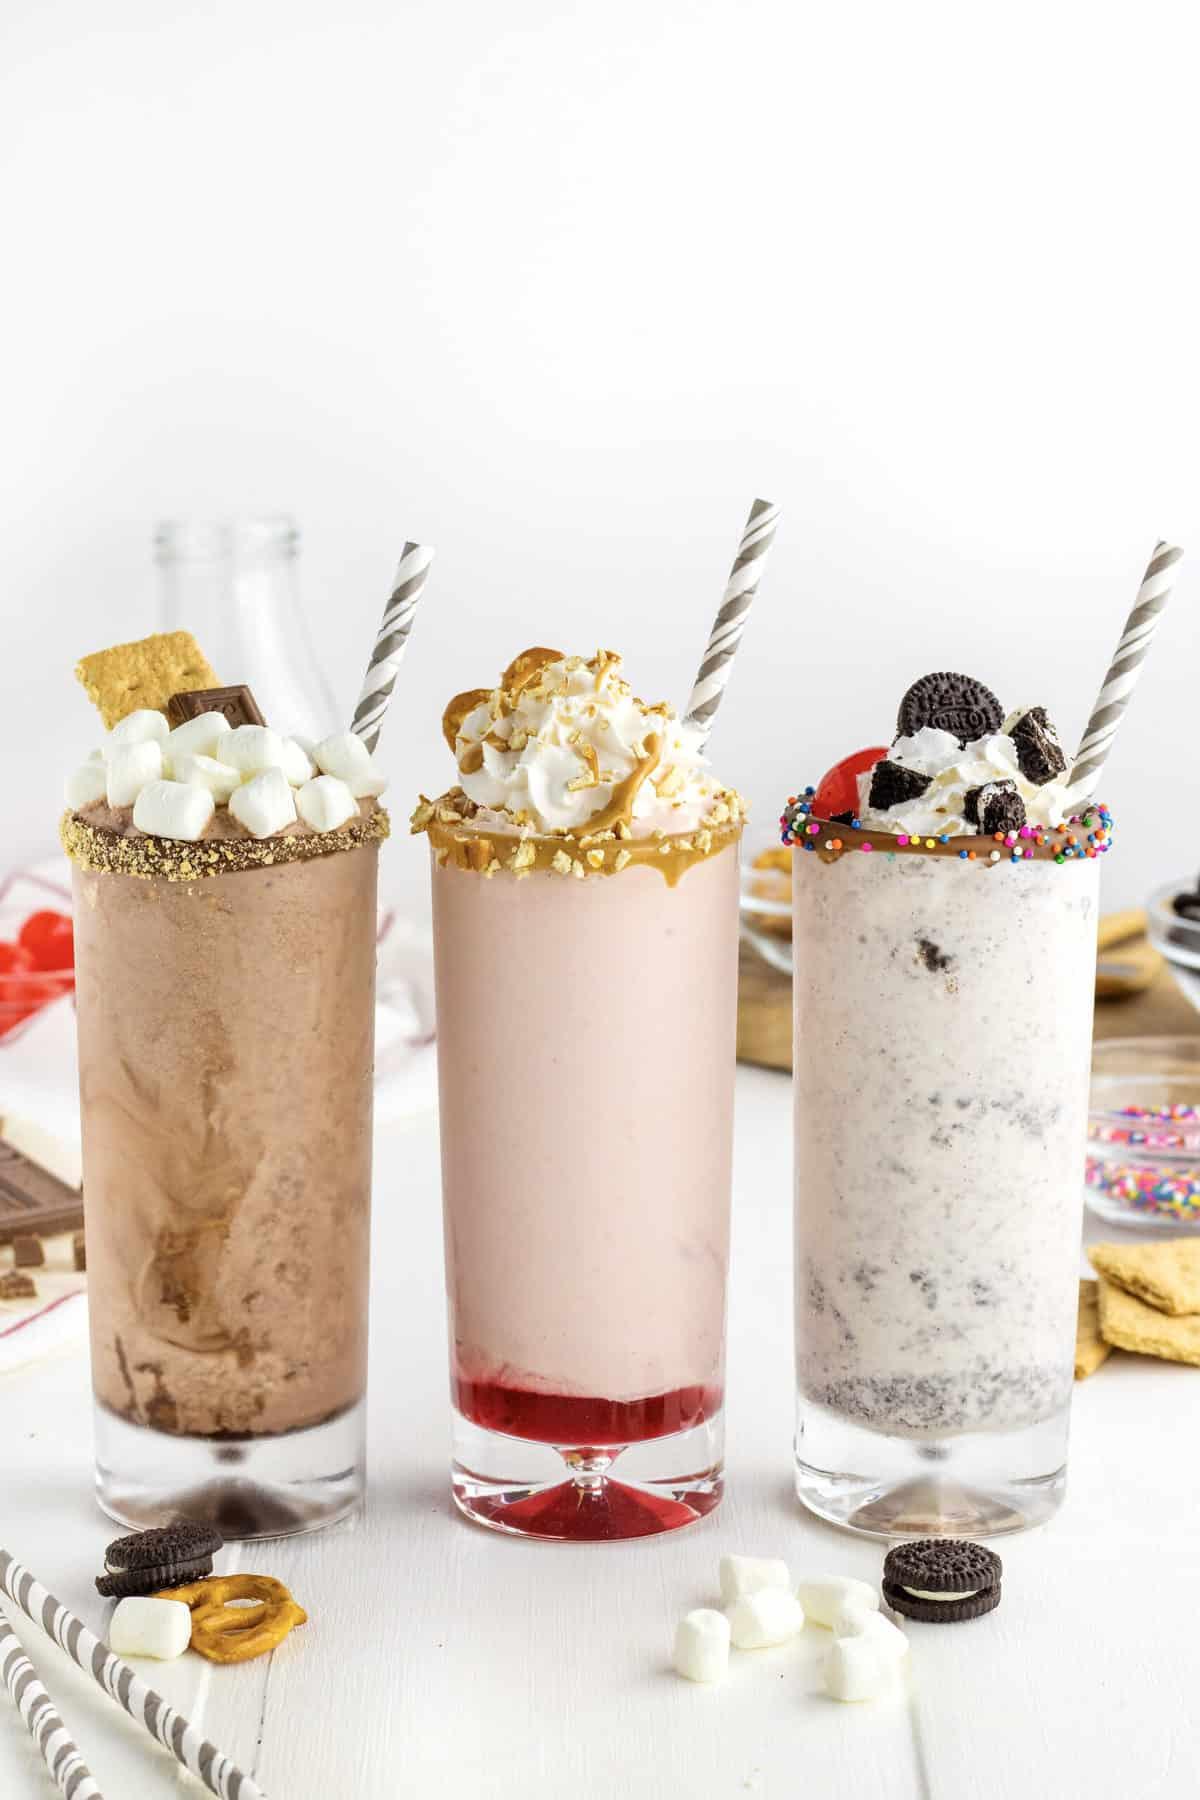 Three Spectacular Milkshake Recipes by The BakerMama